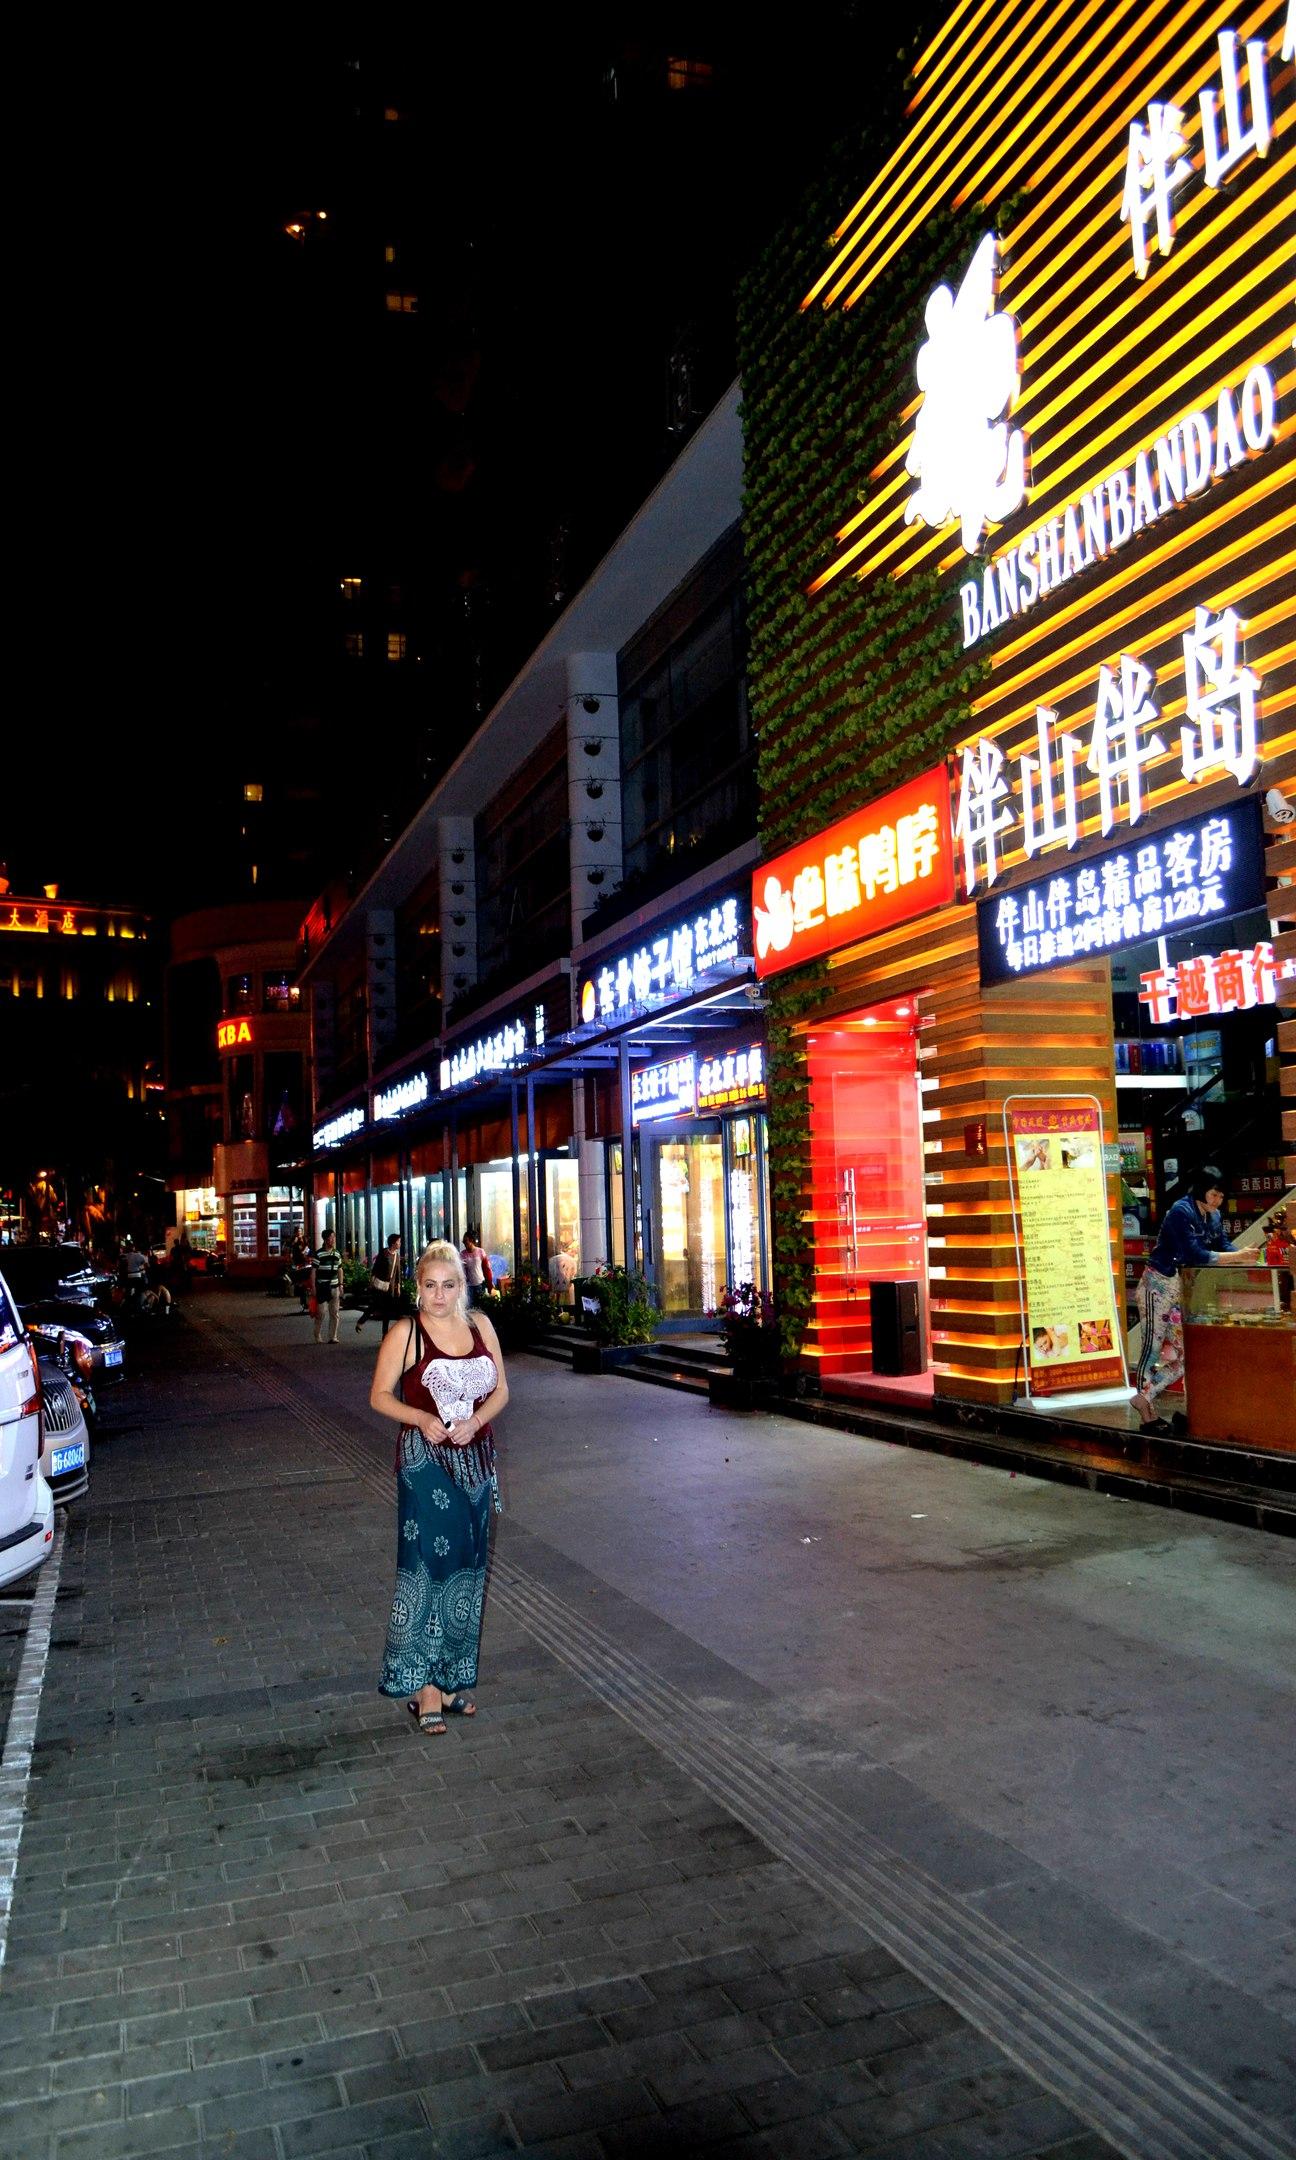 Елена Руденко (Валтея). Китай, о.Хайнань, г.Санья. (фото) - Страница 2 ALCZ1W1yhlw